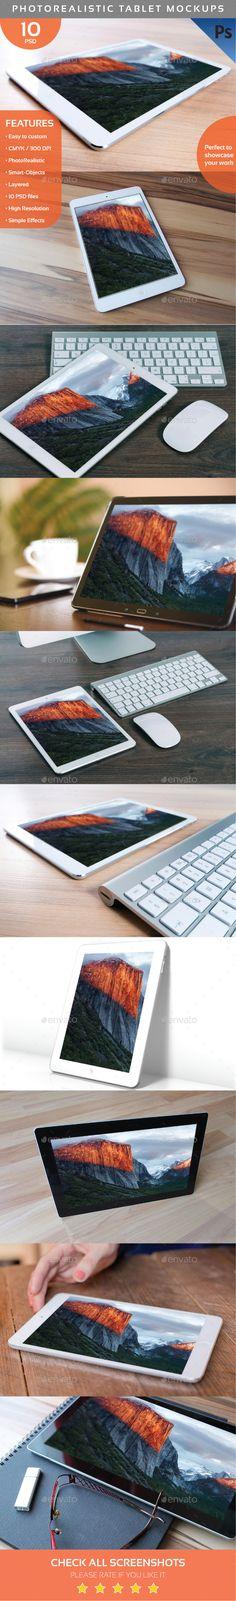 Photorealistic Tablet Mockups  (Displays)